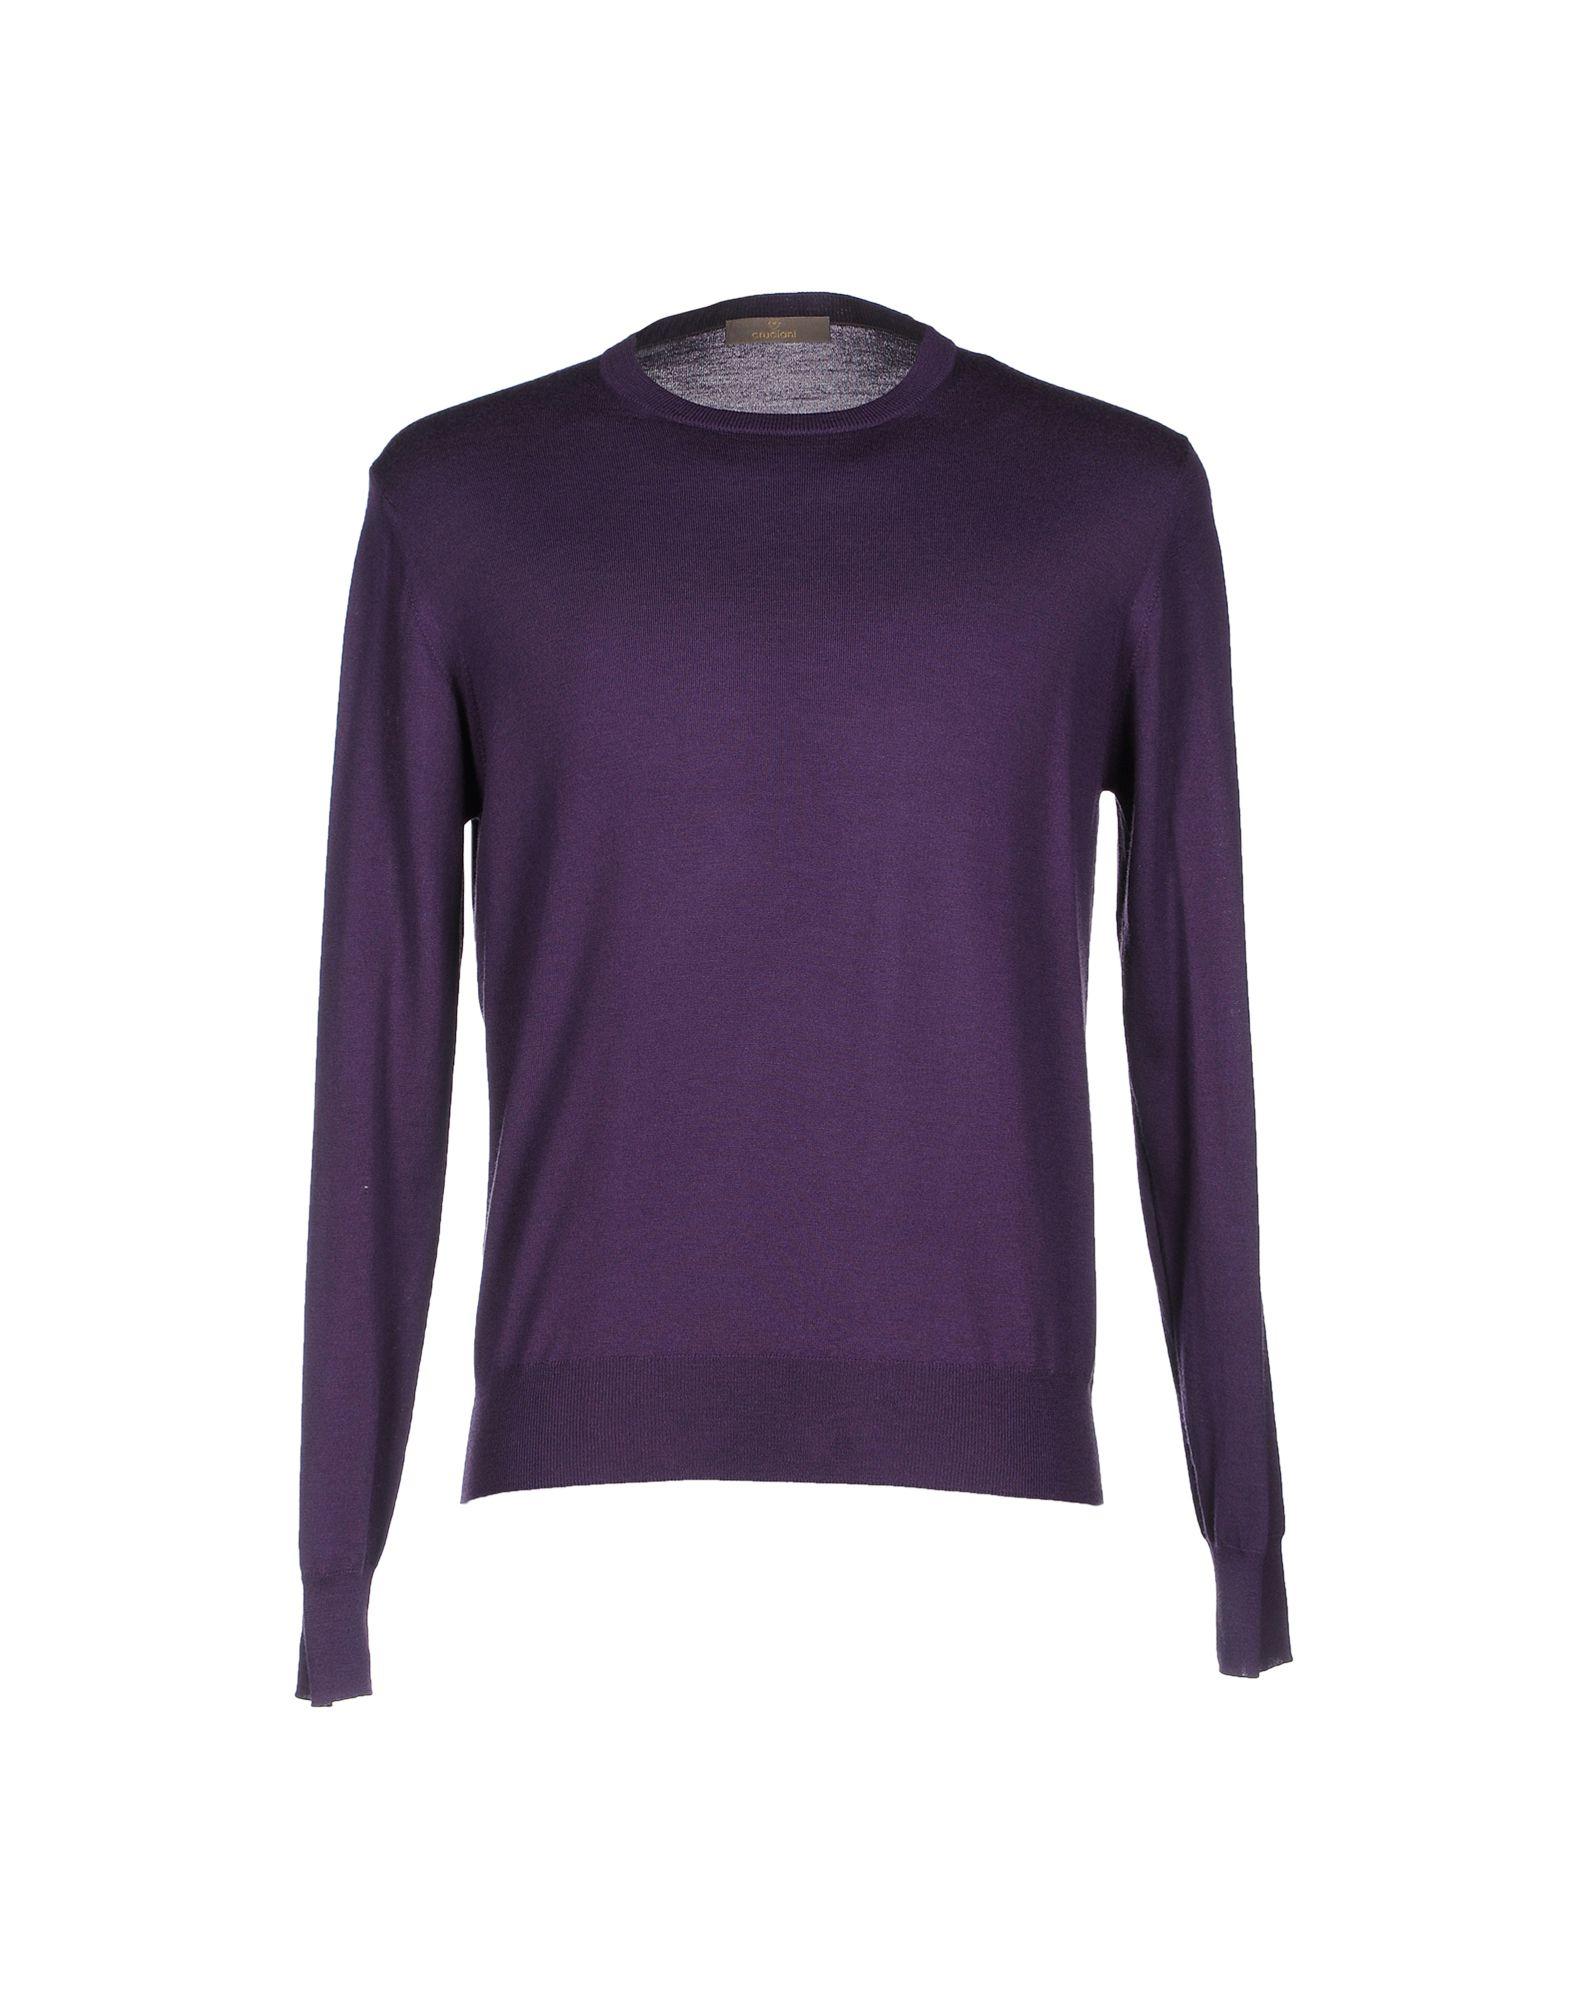 Purple Sweater For Men 118